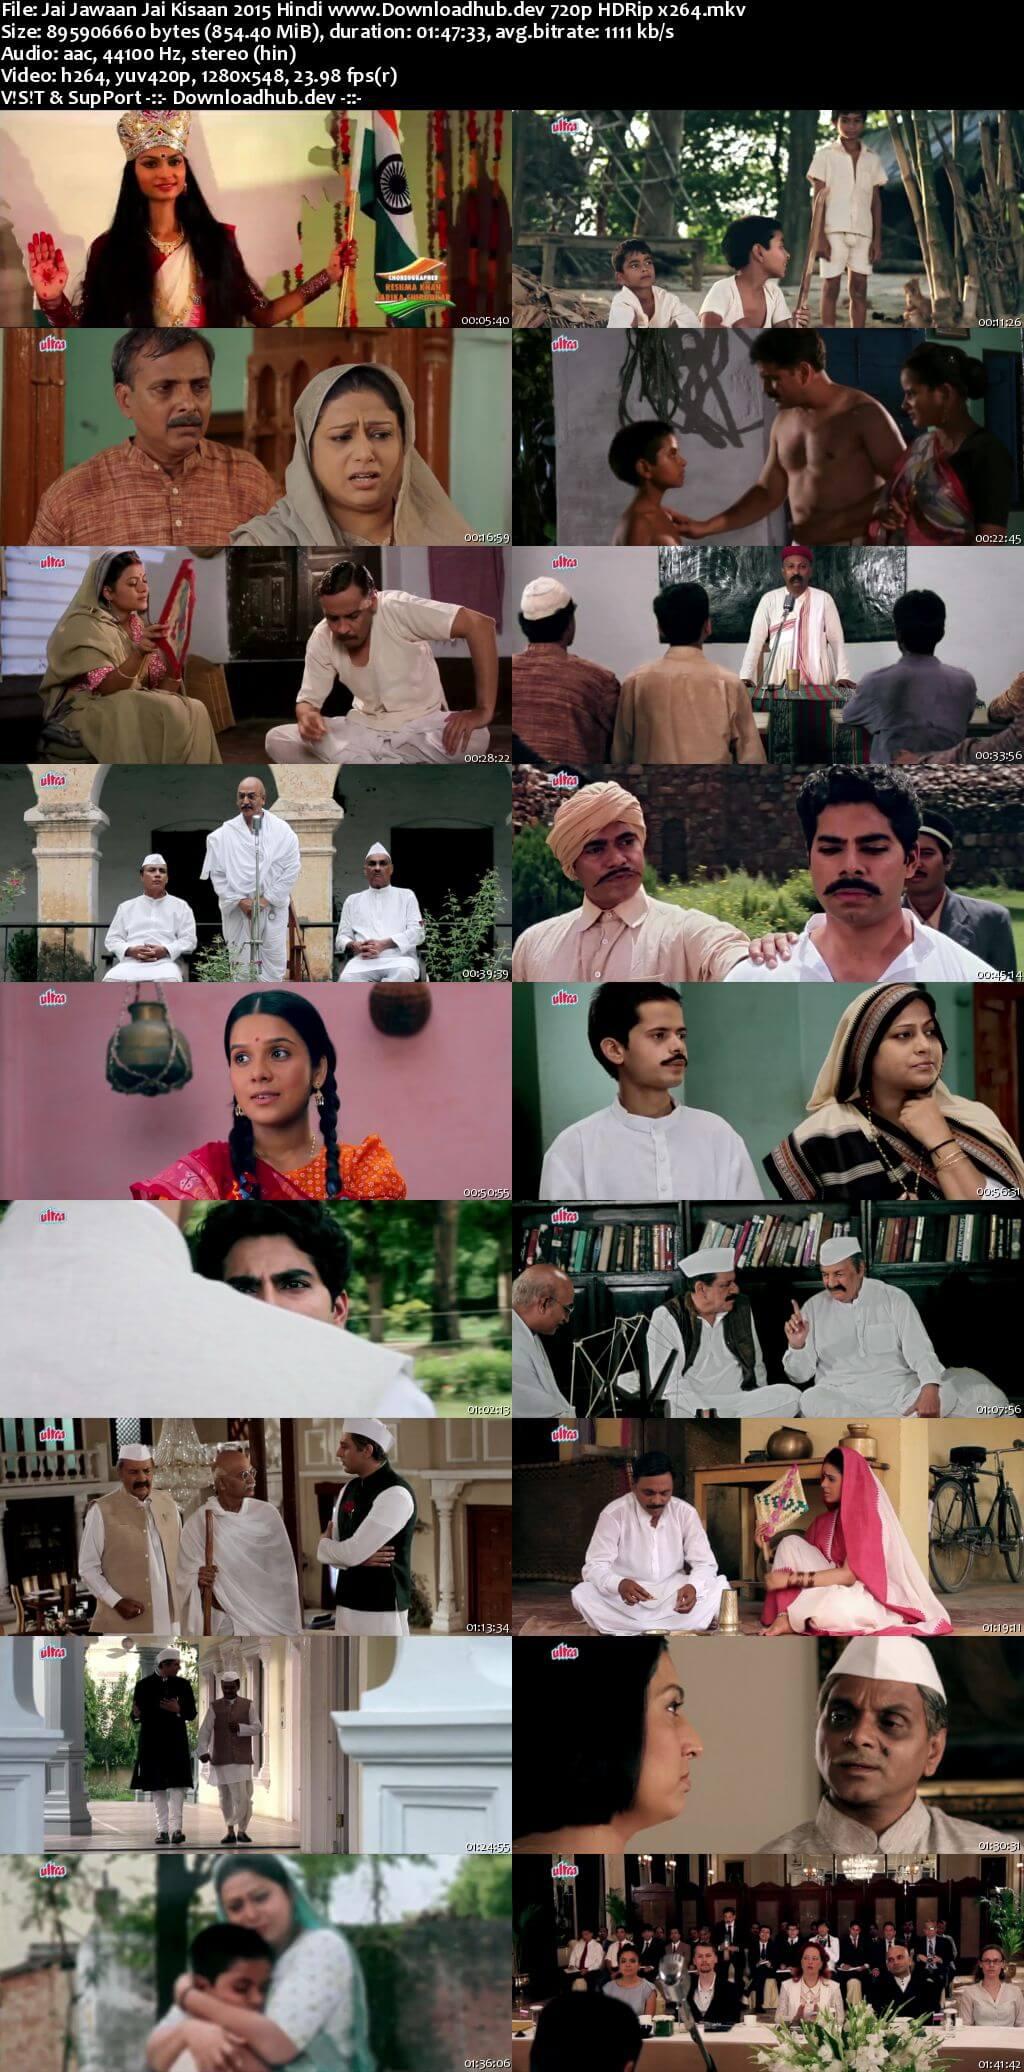 Jai Jawaan Jai Kisaan 2015 Hindi 720p HDRip x264